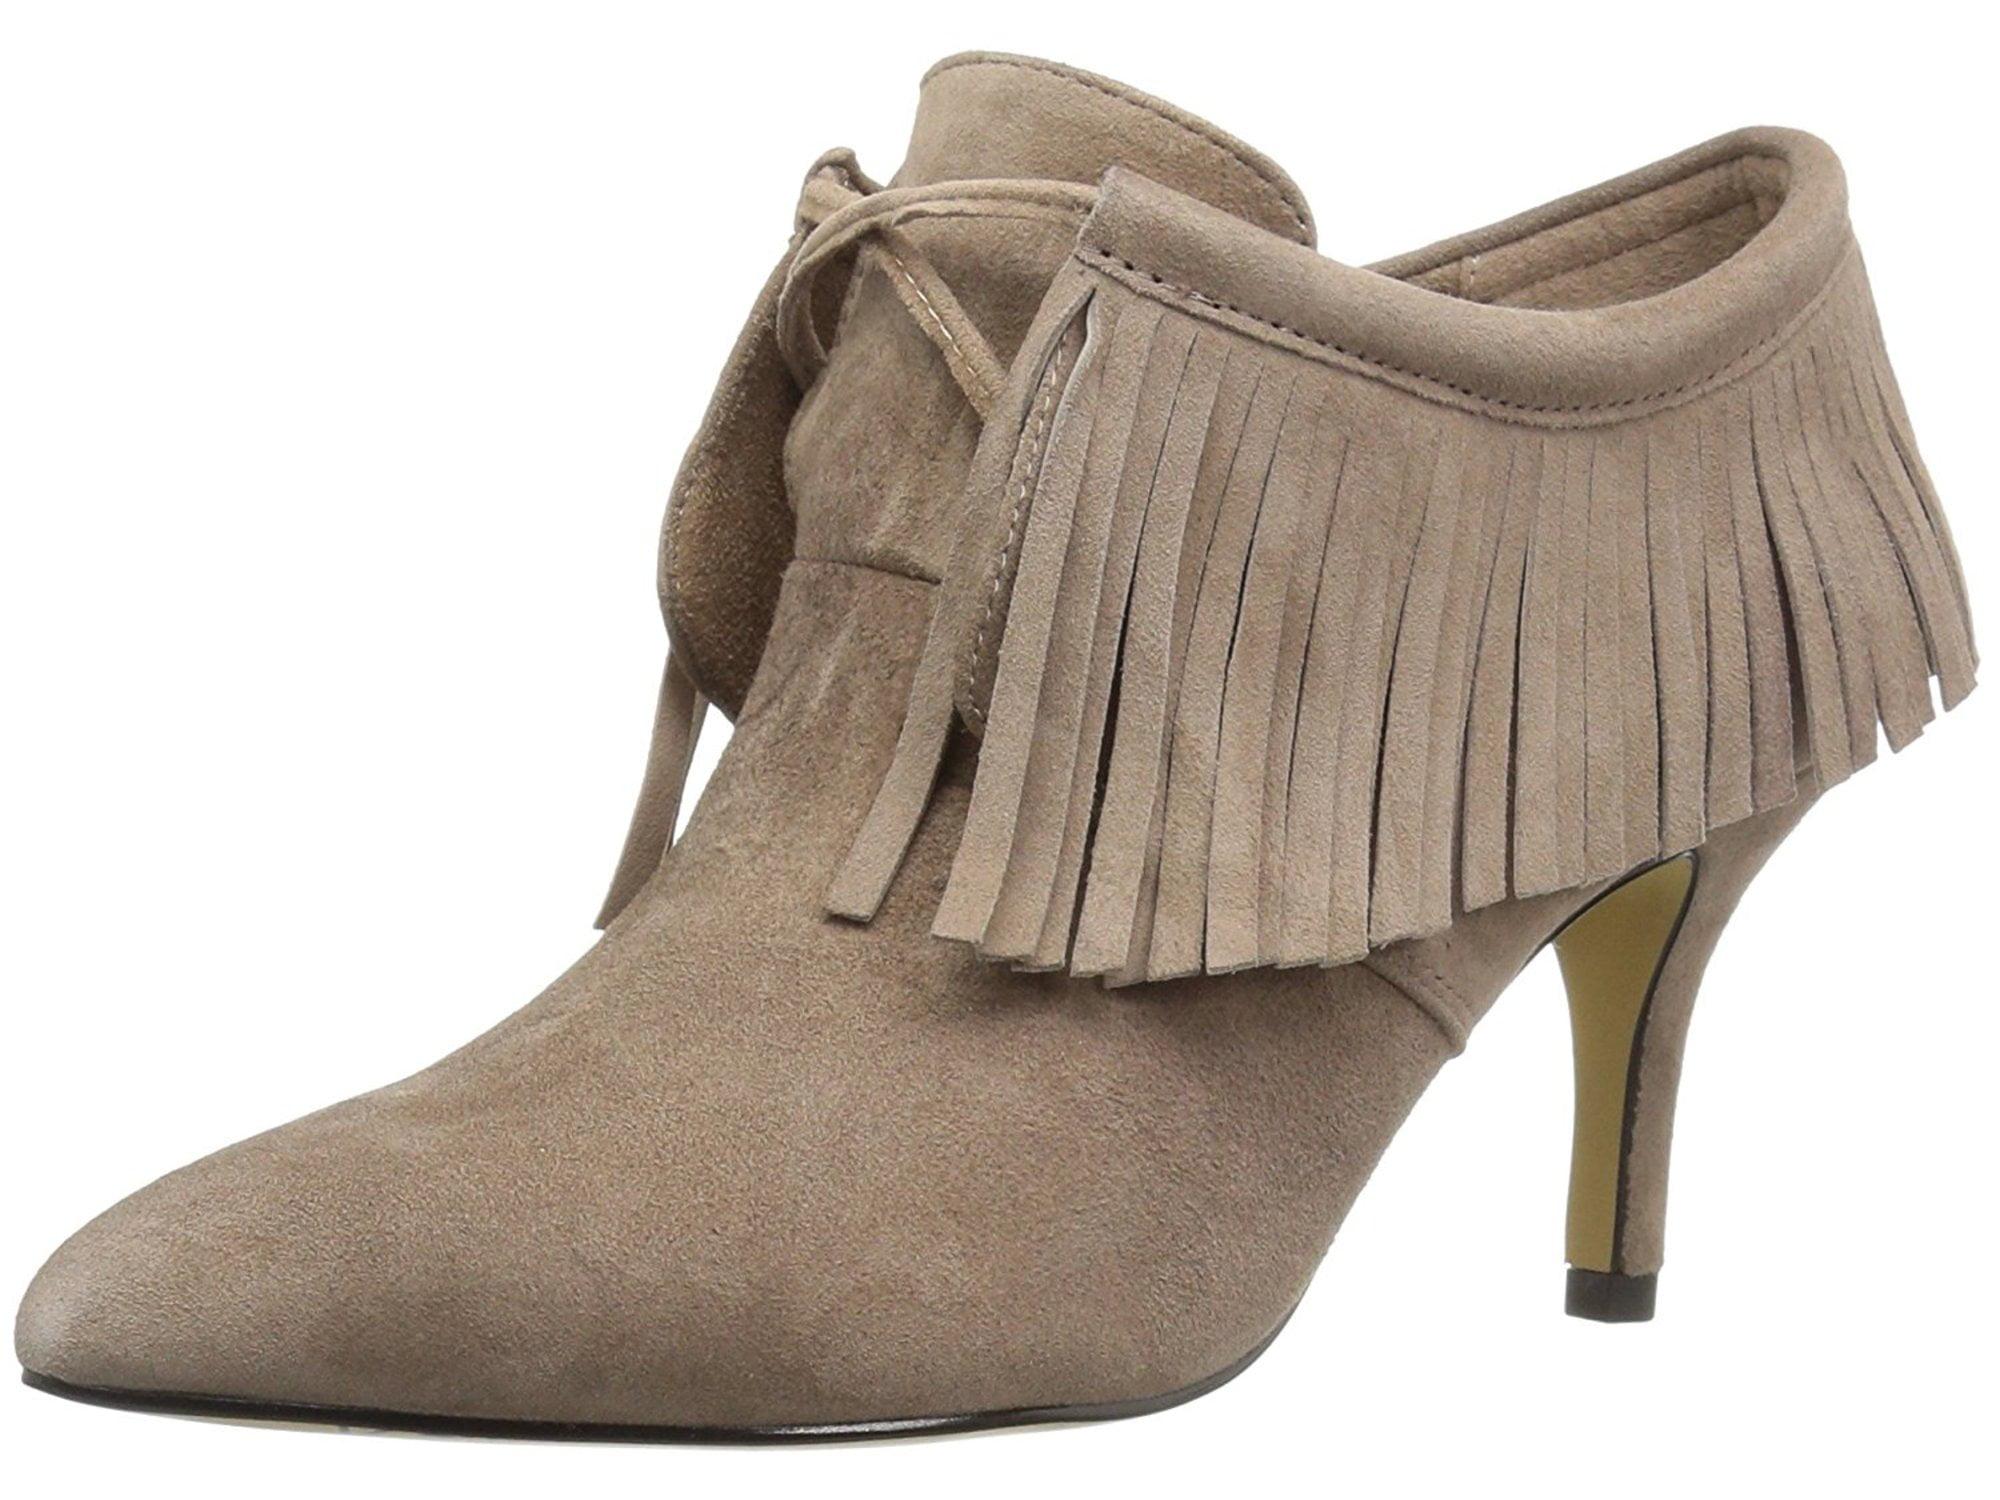 Bella Vita Womens Diem Leather Pointed Toe Classic Pumps by Bella Vita